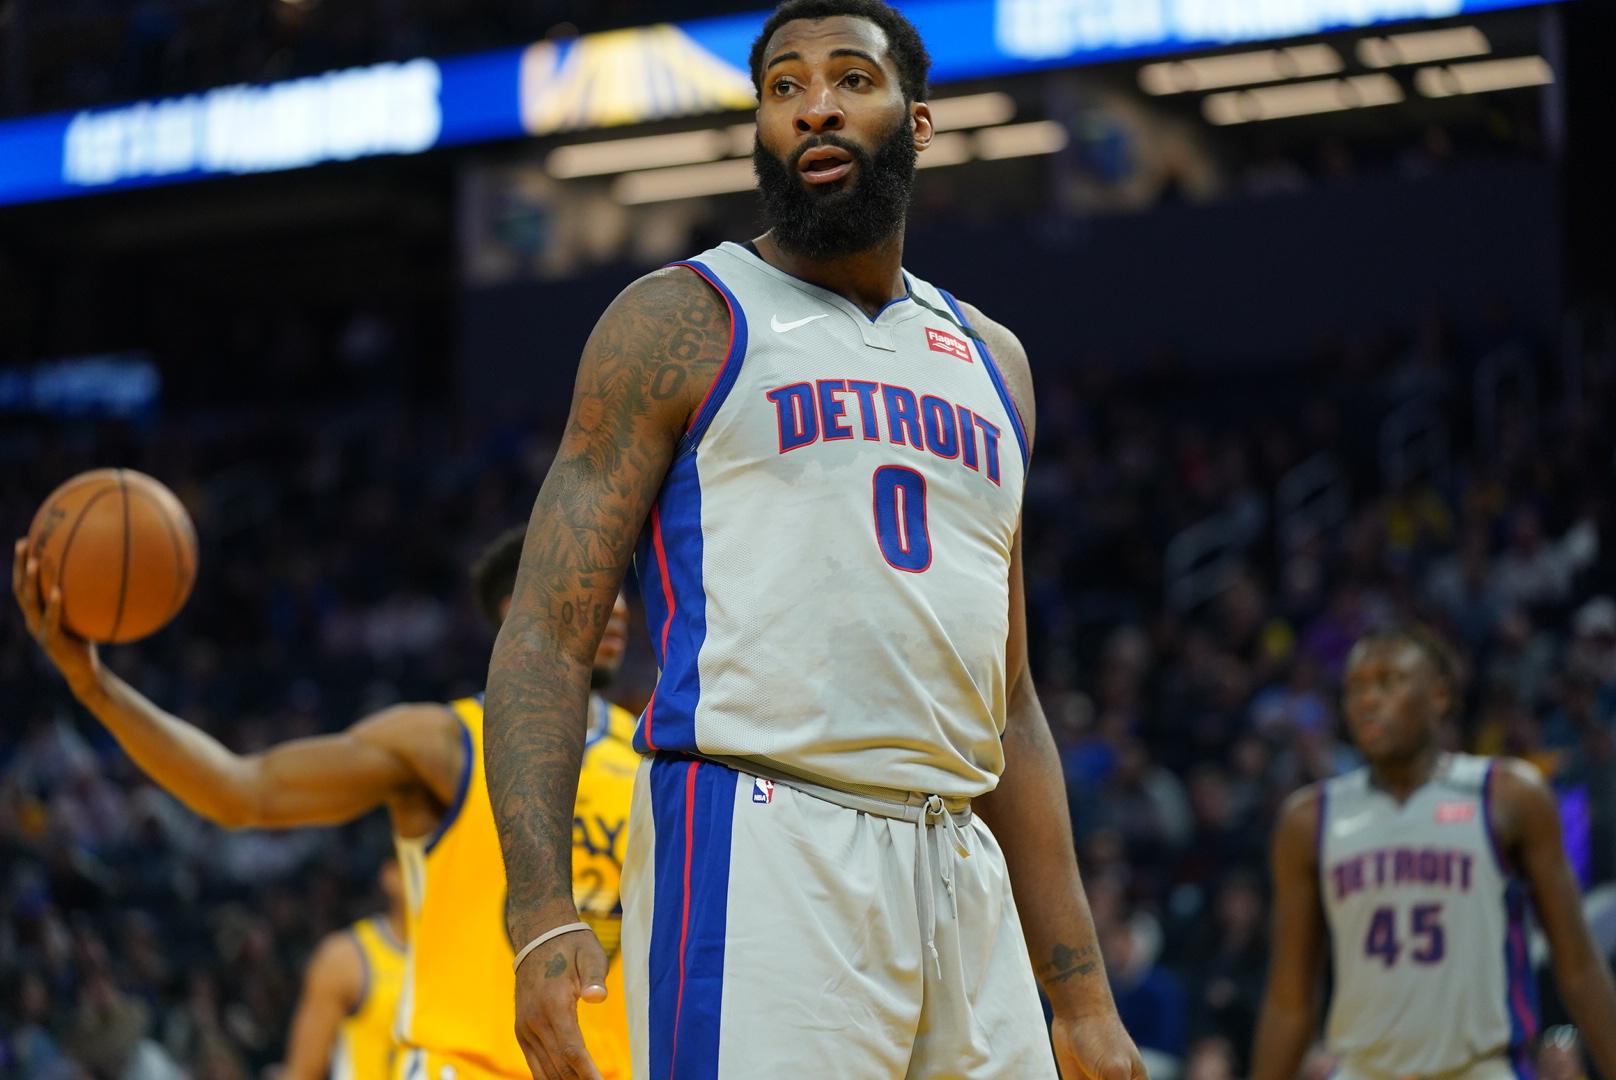 Pistons no longer plan to trade Andre Drummond, despite rumors